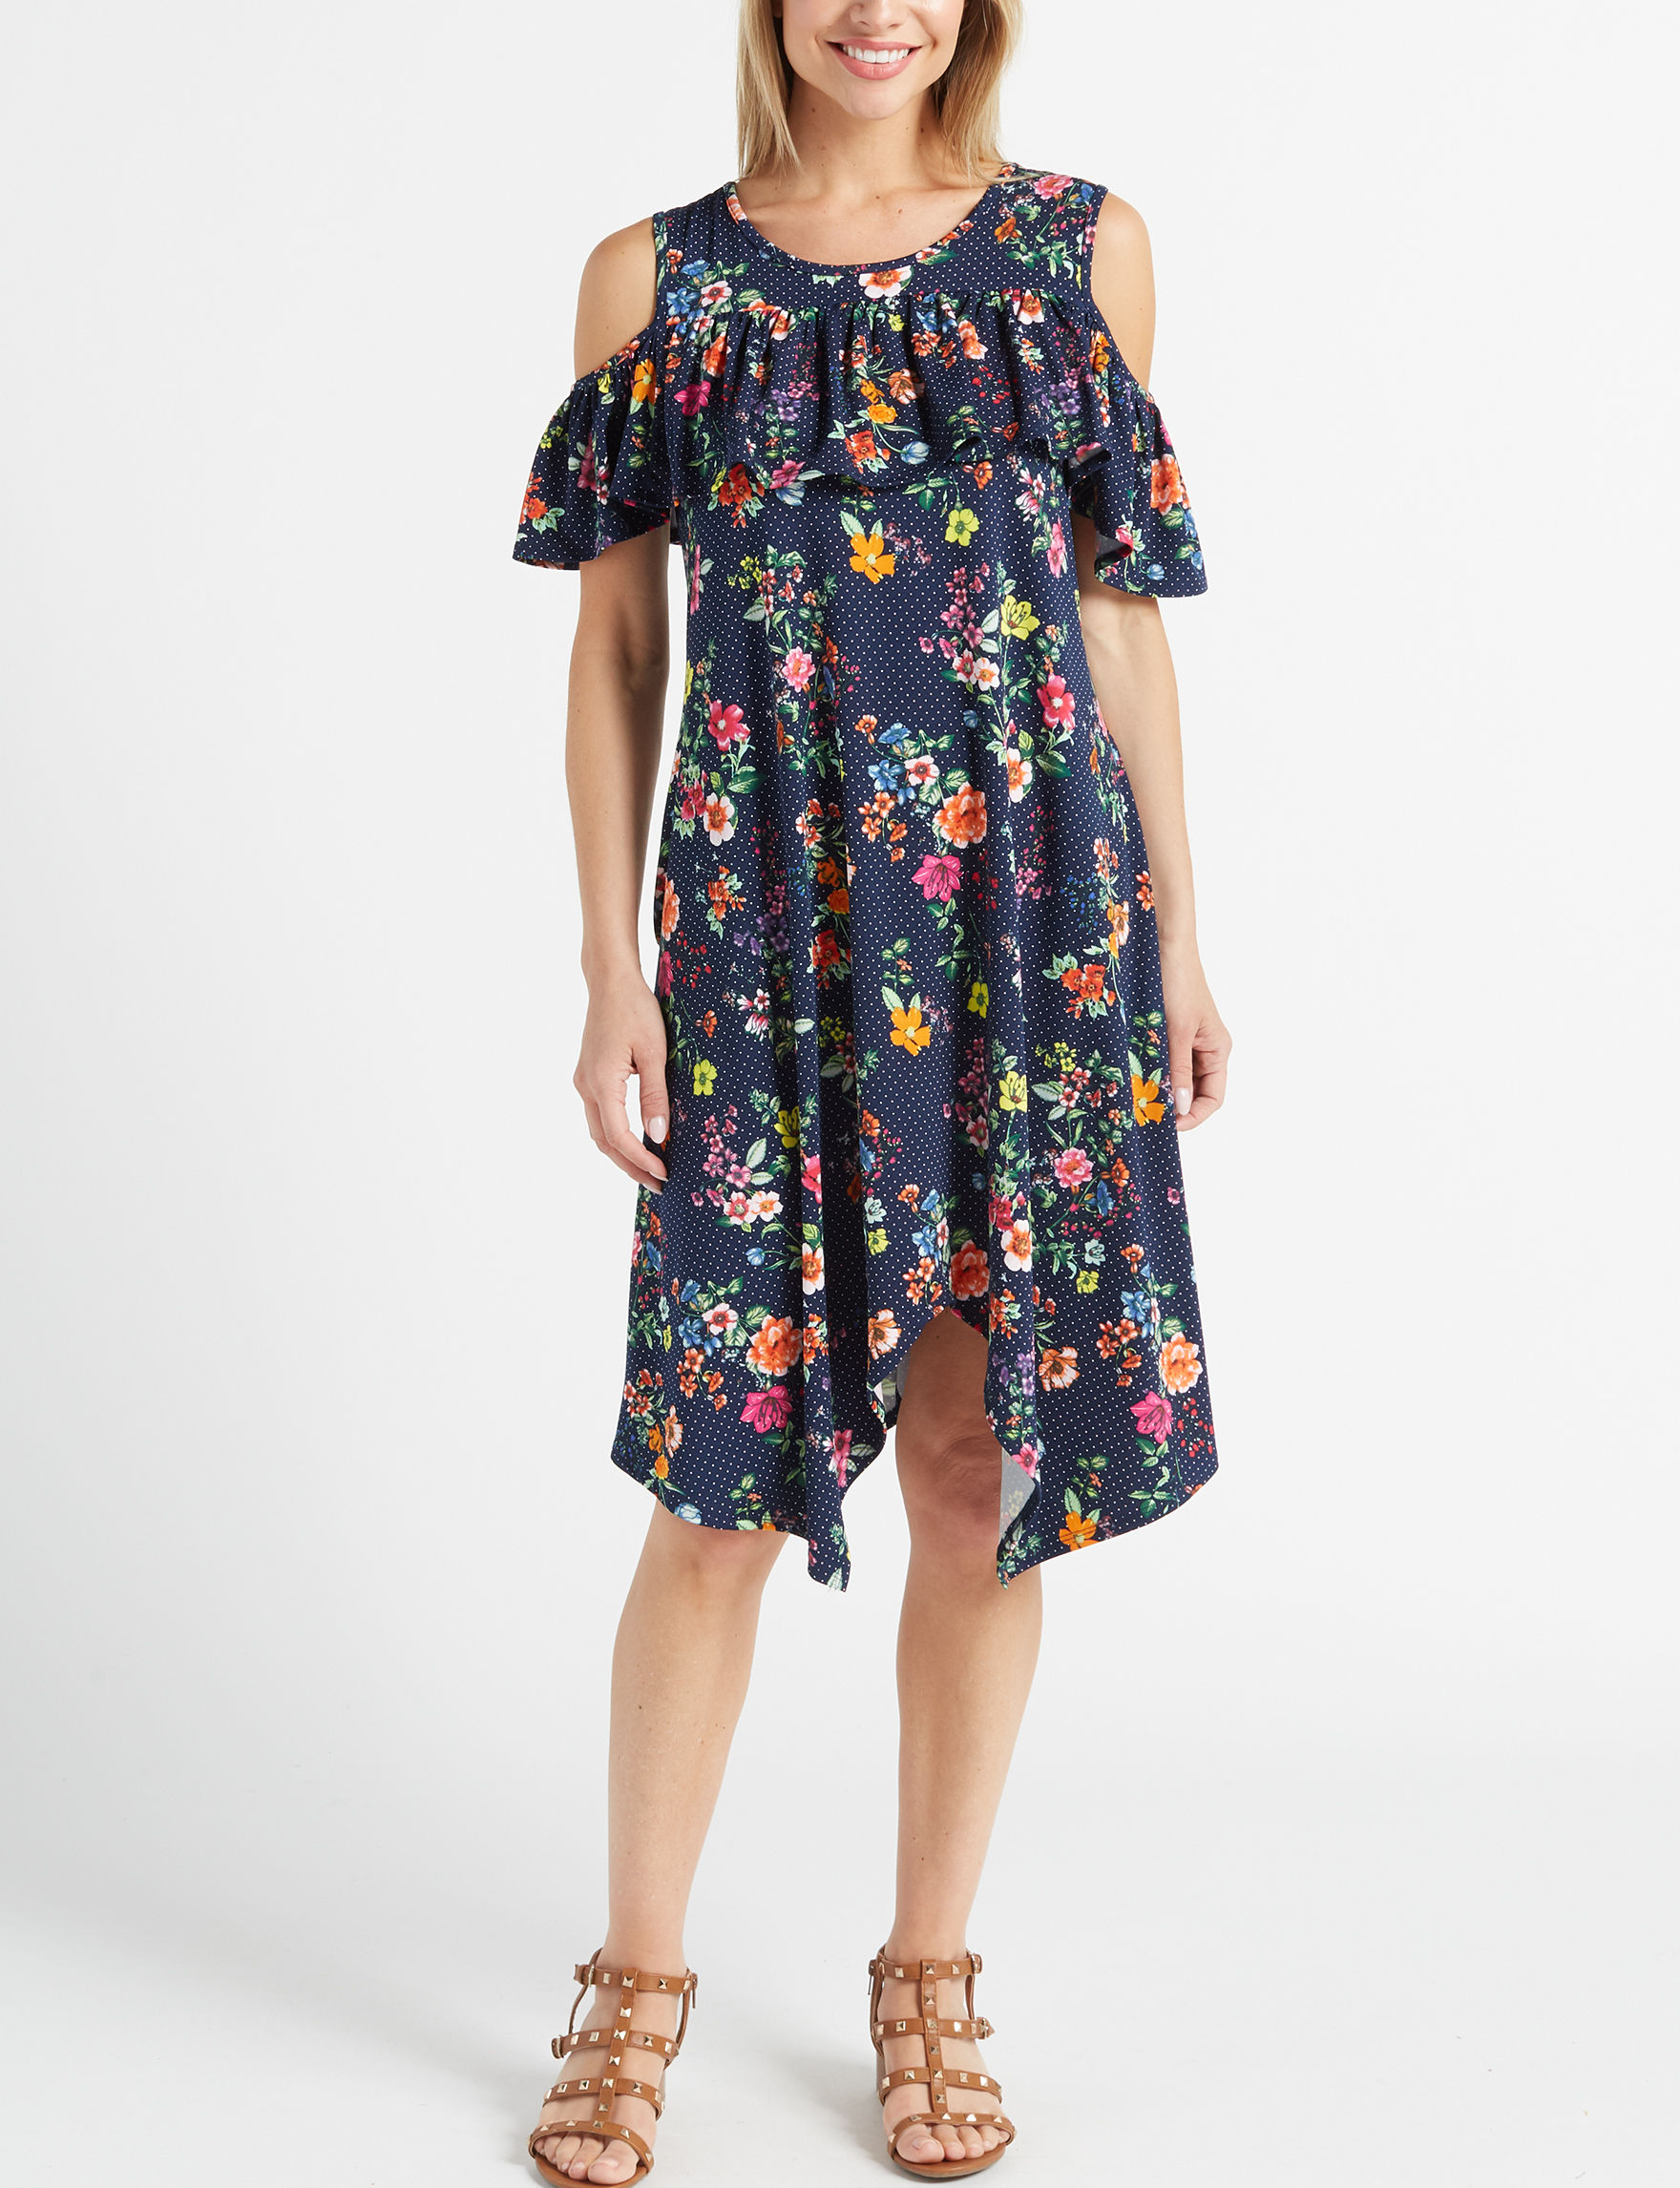 Nina Leonard Navy / Multi Everyday & Casual Shift Dresses